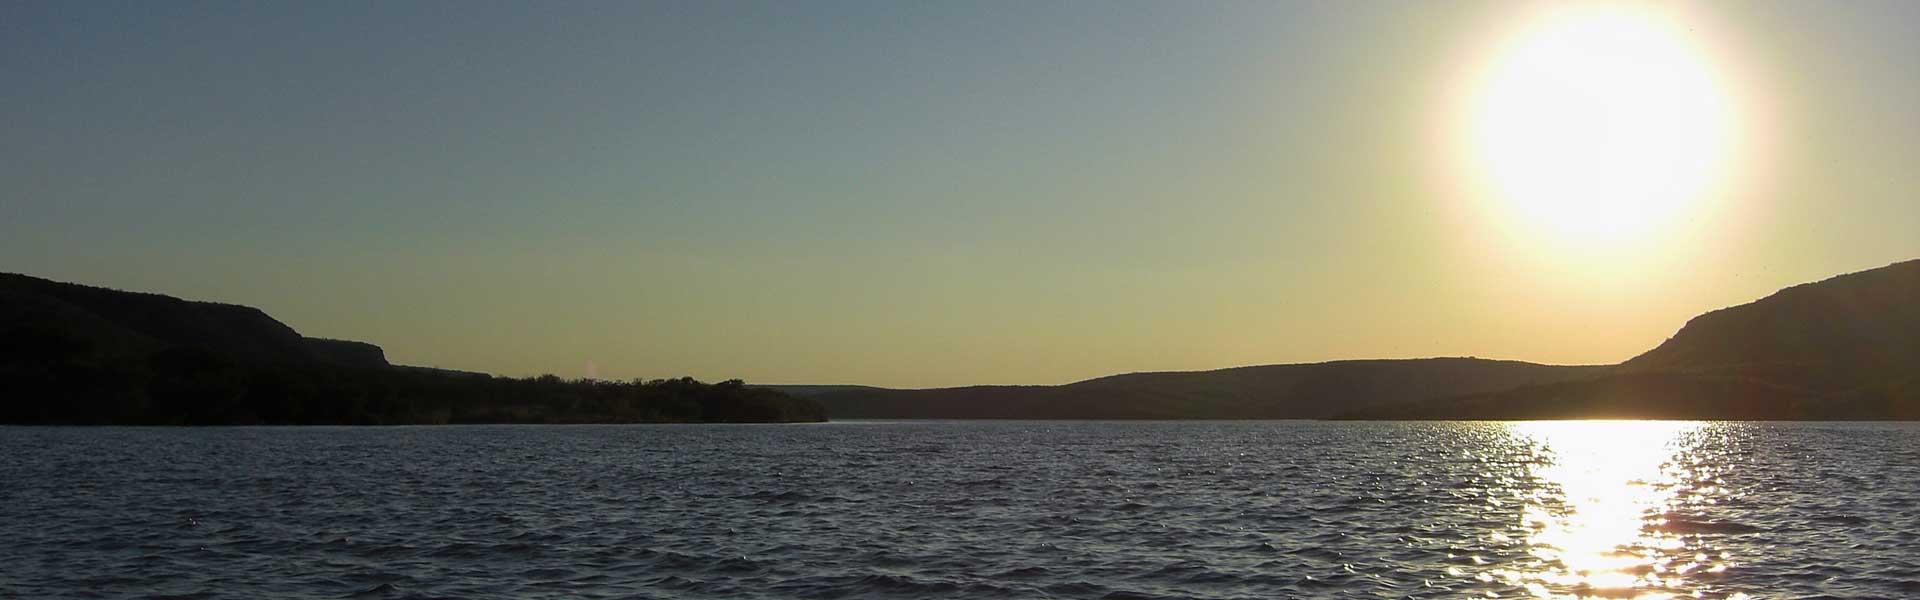 Lake Amistad Rentals